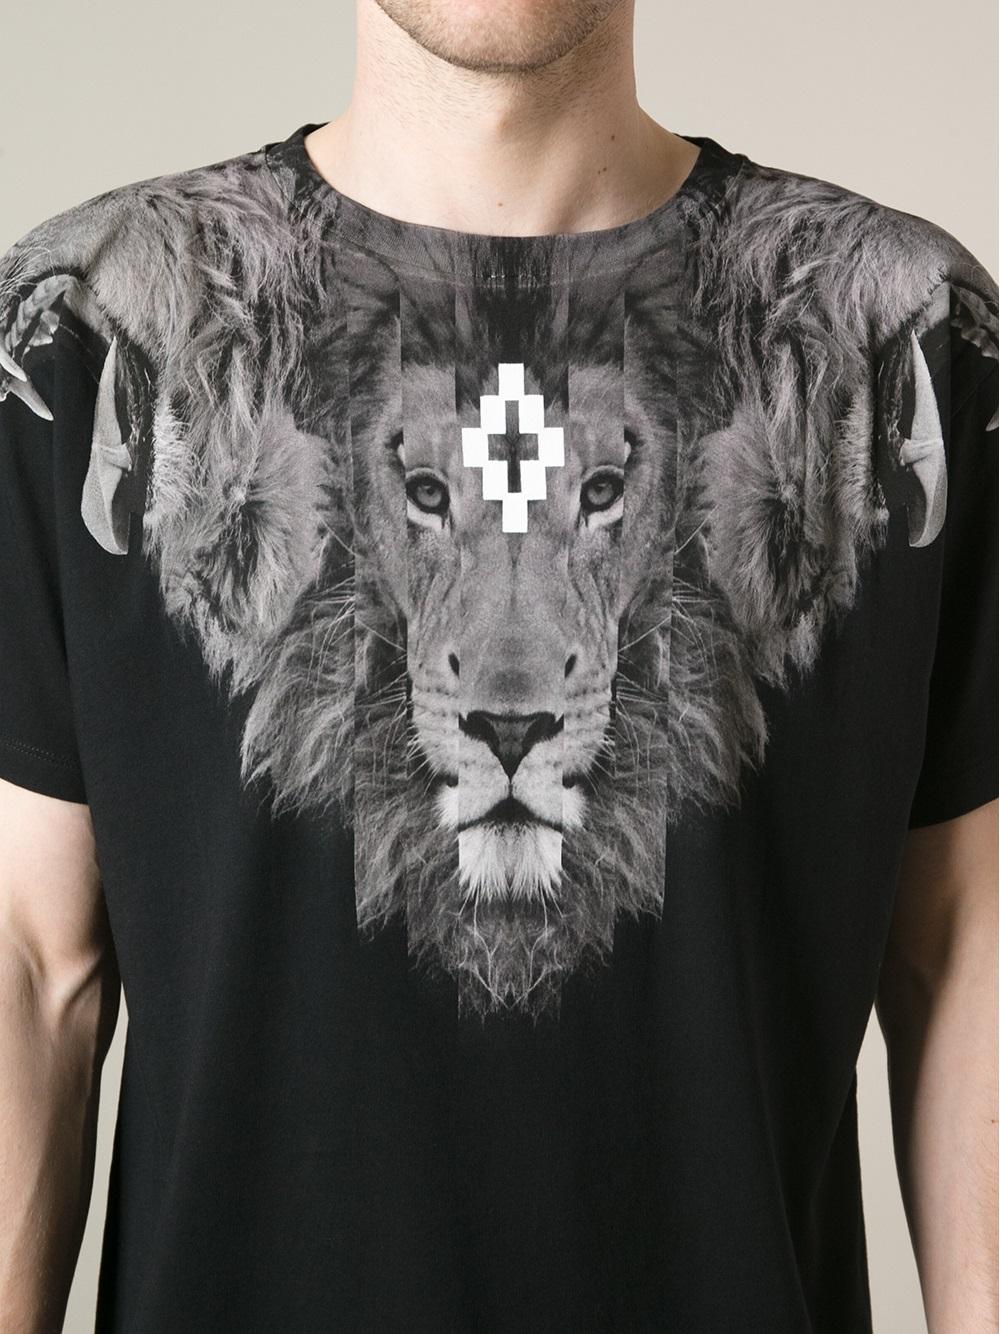 California Shirts For Men